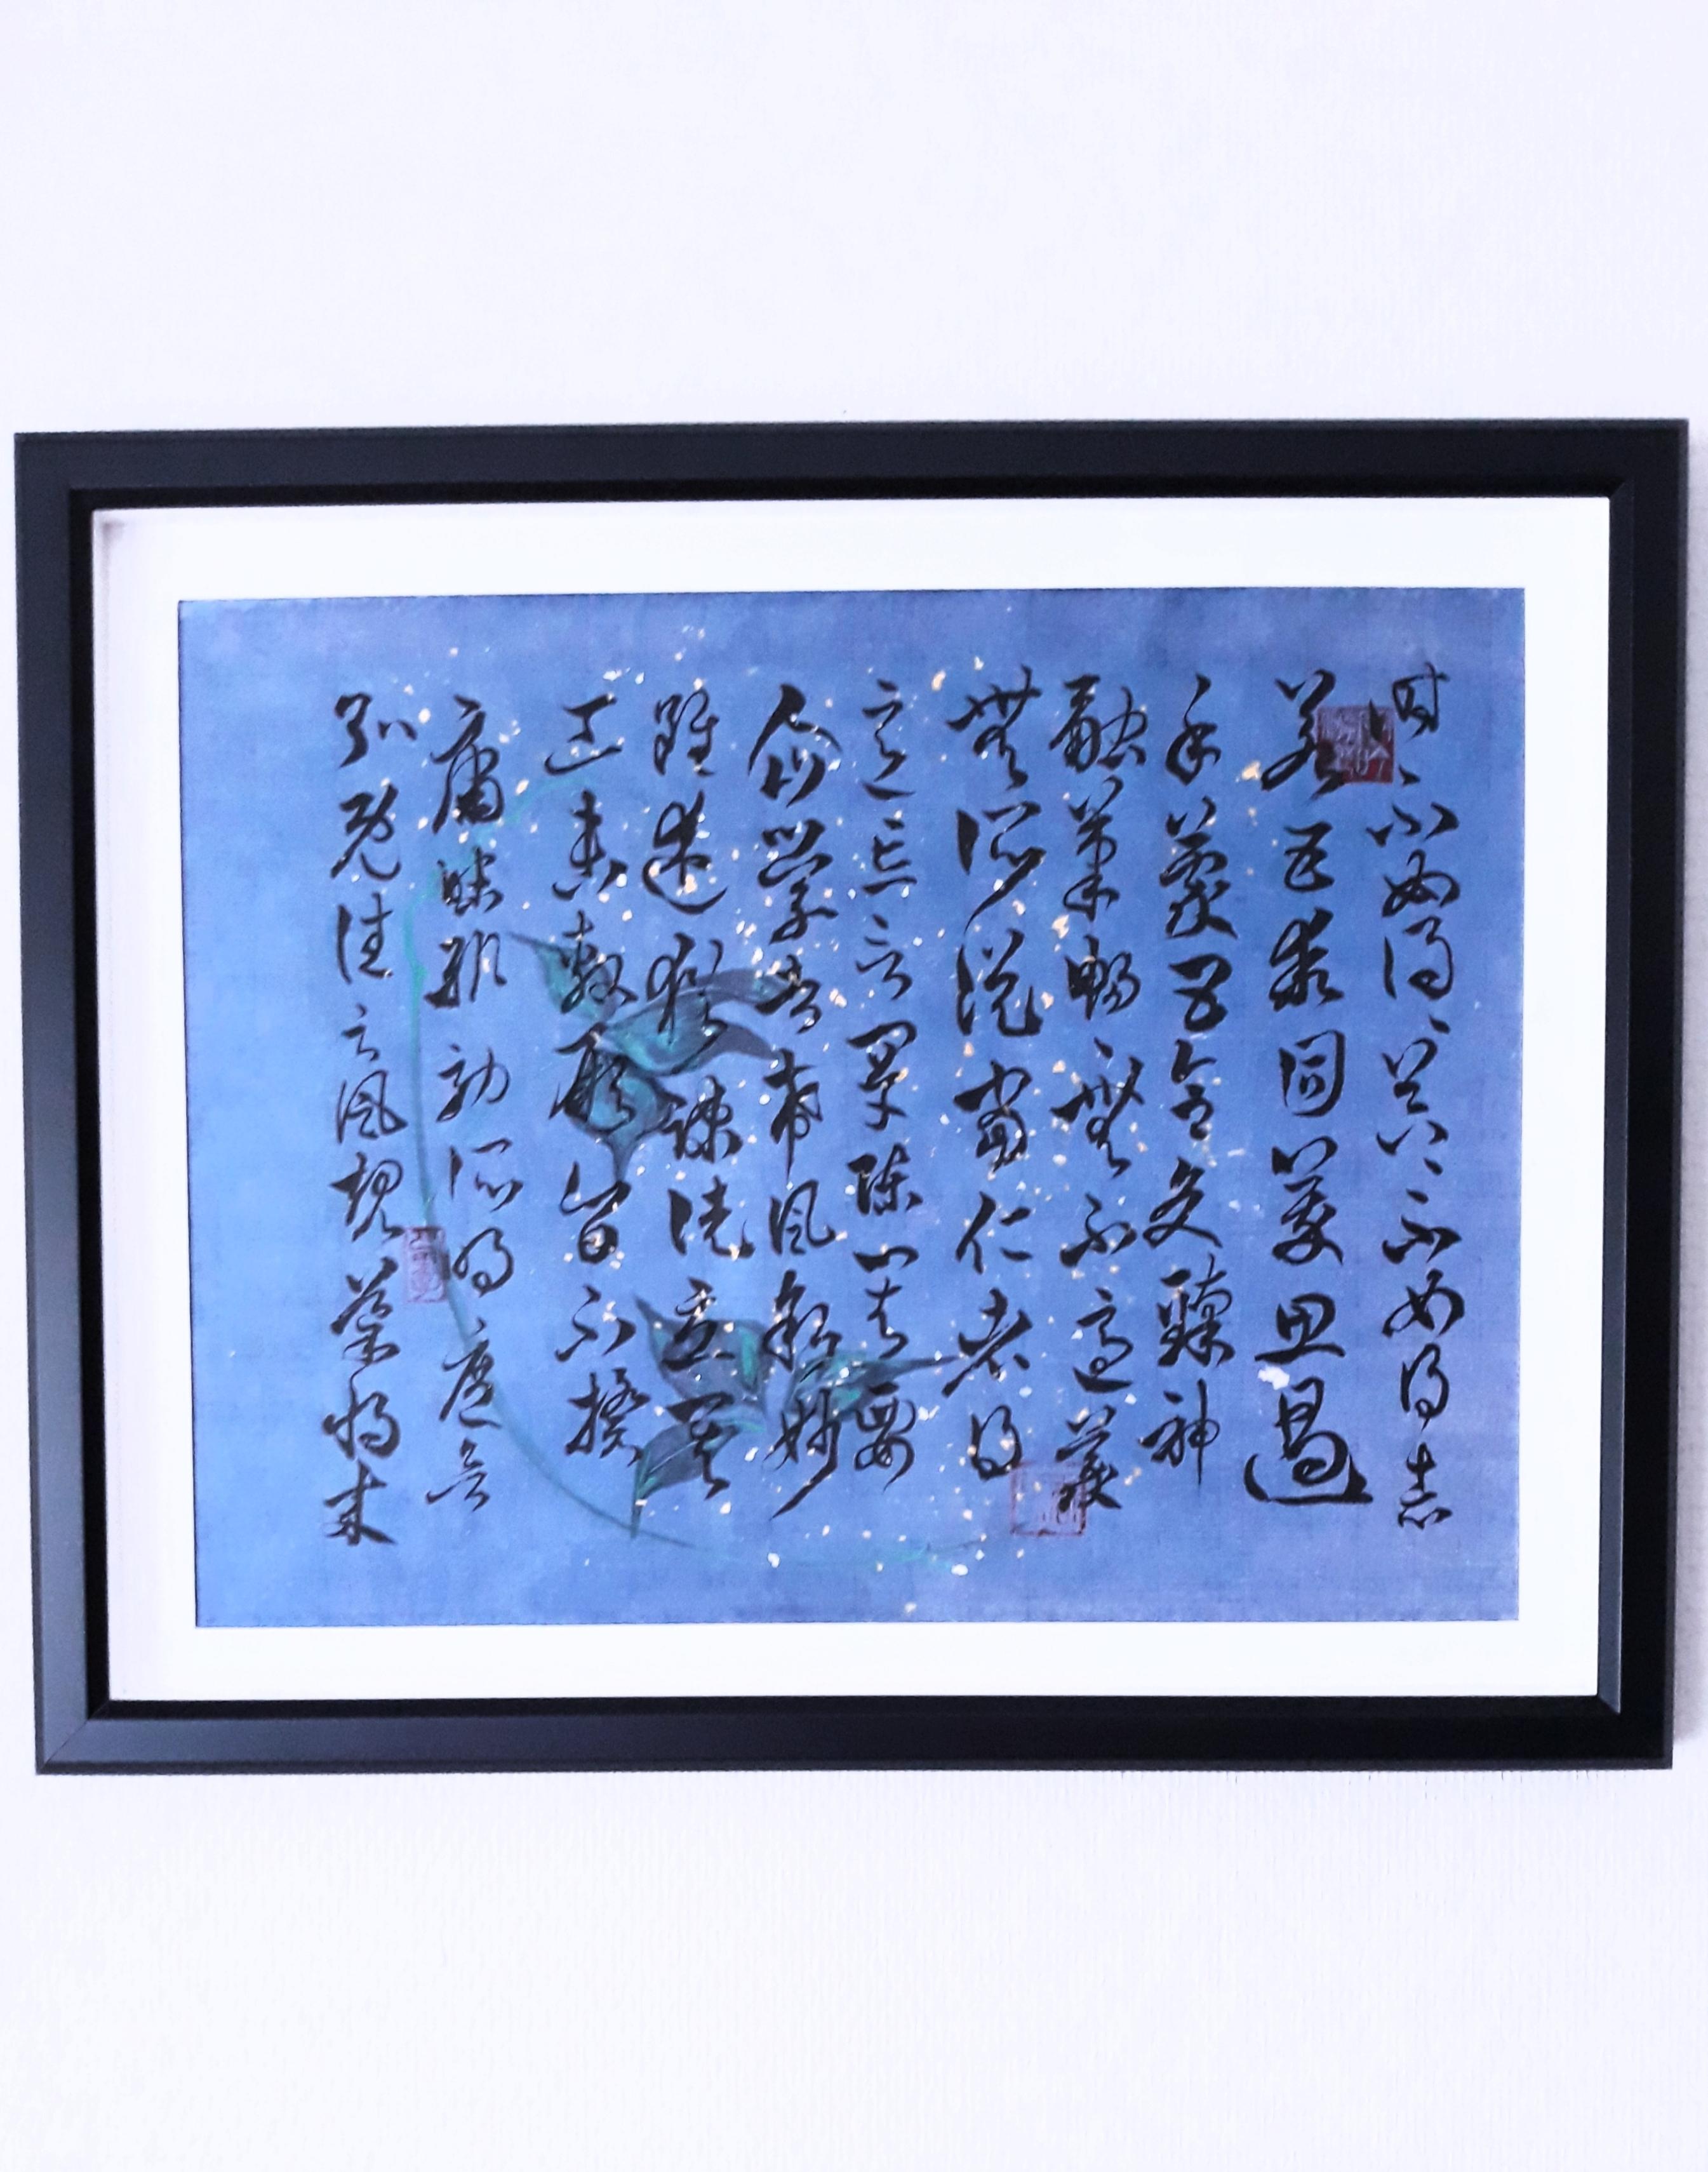 Texte de Sun Guoting en cursive 53cm x 43cm